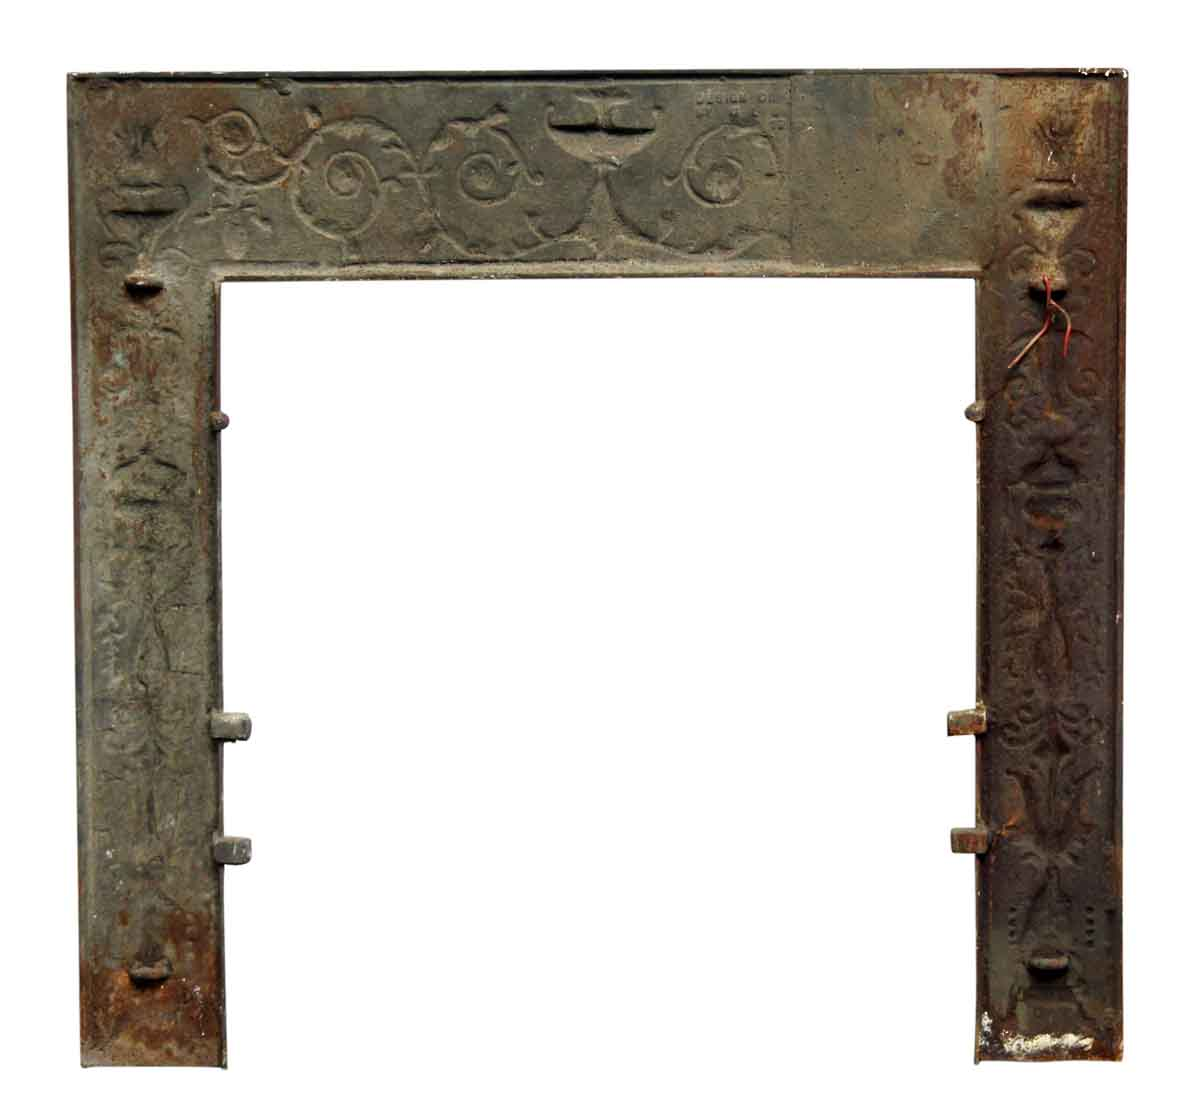 Mantel Cast Iron Fireplace Insert